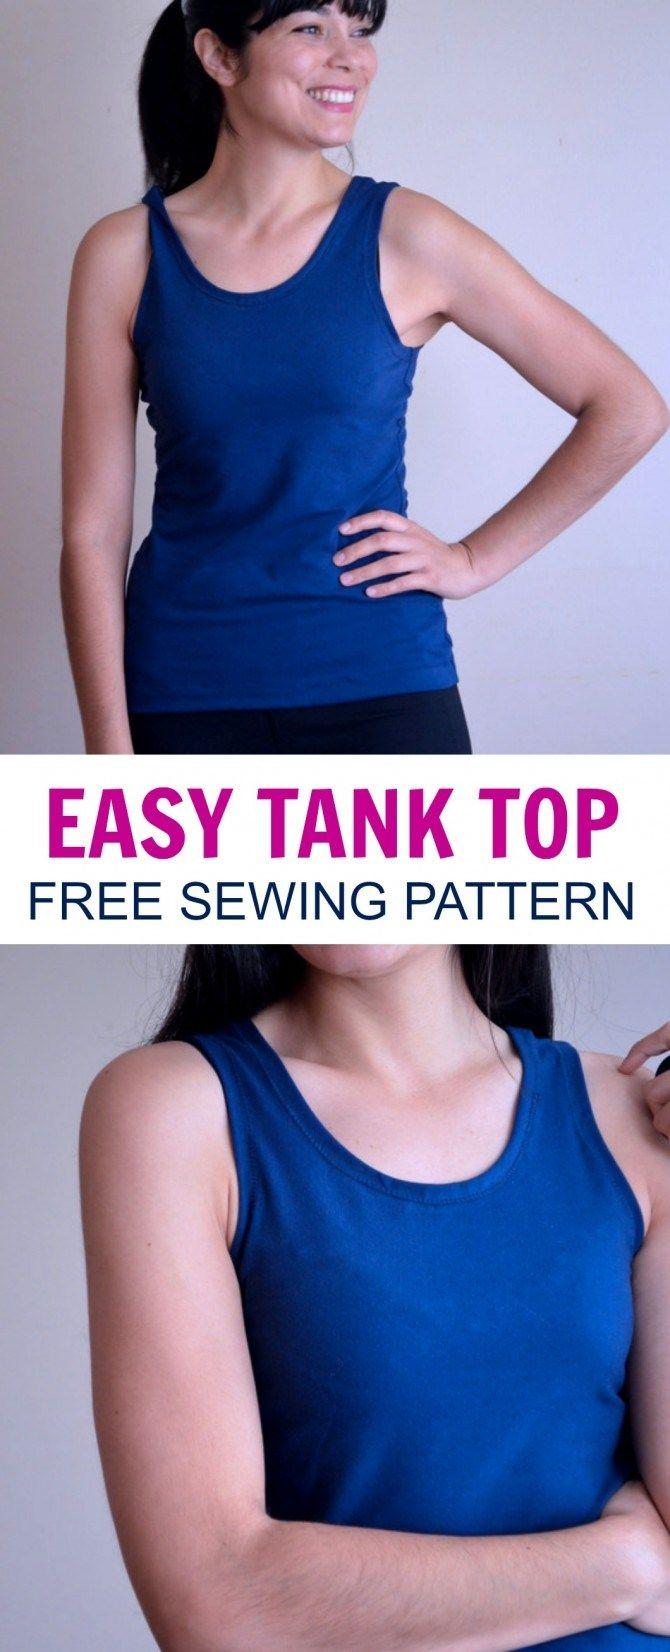 FREE Printable sewing patterns for ladies tops -   14 dress DIY free printable ideas